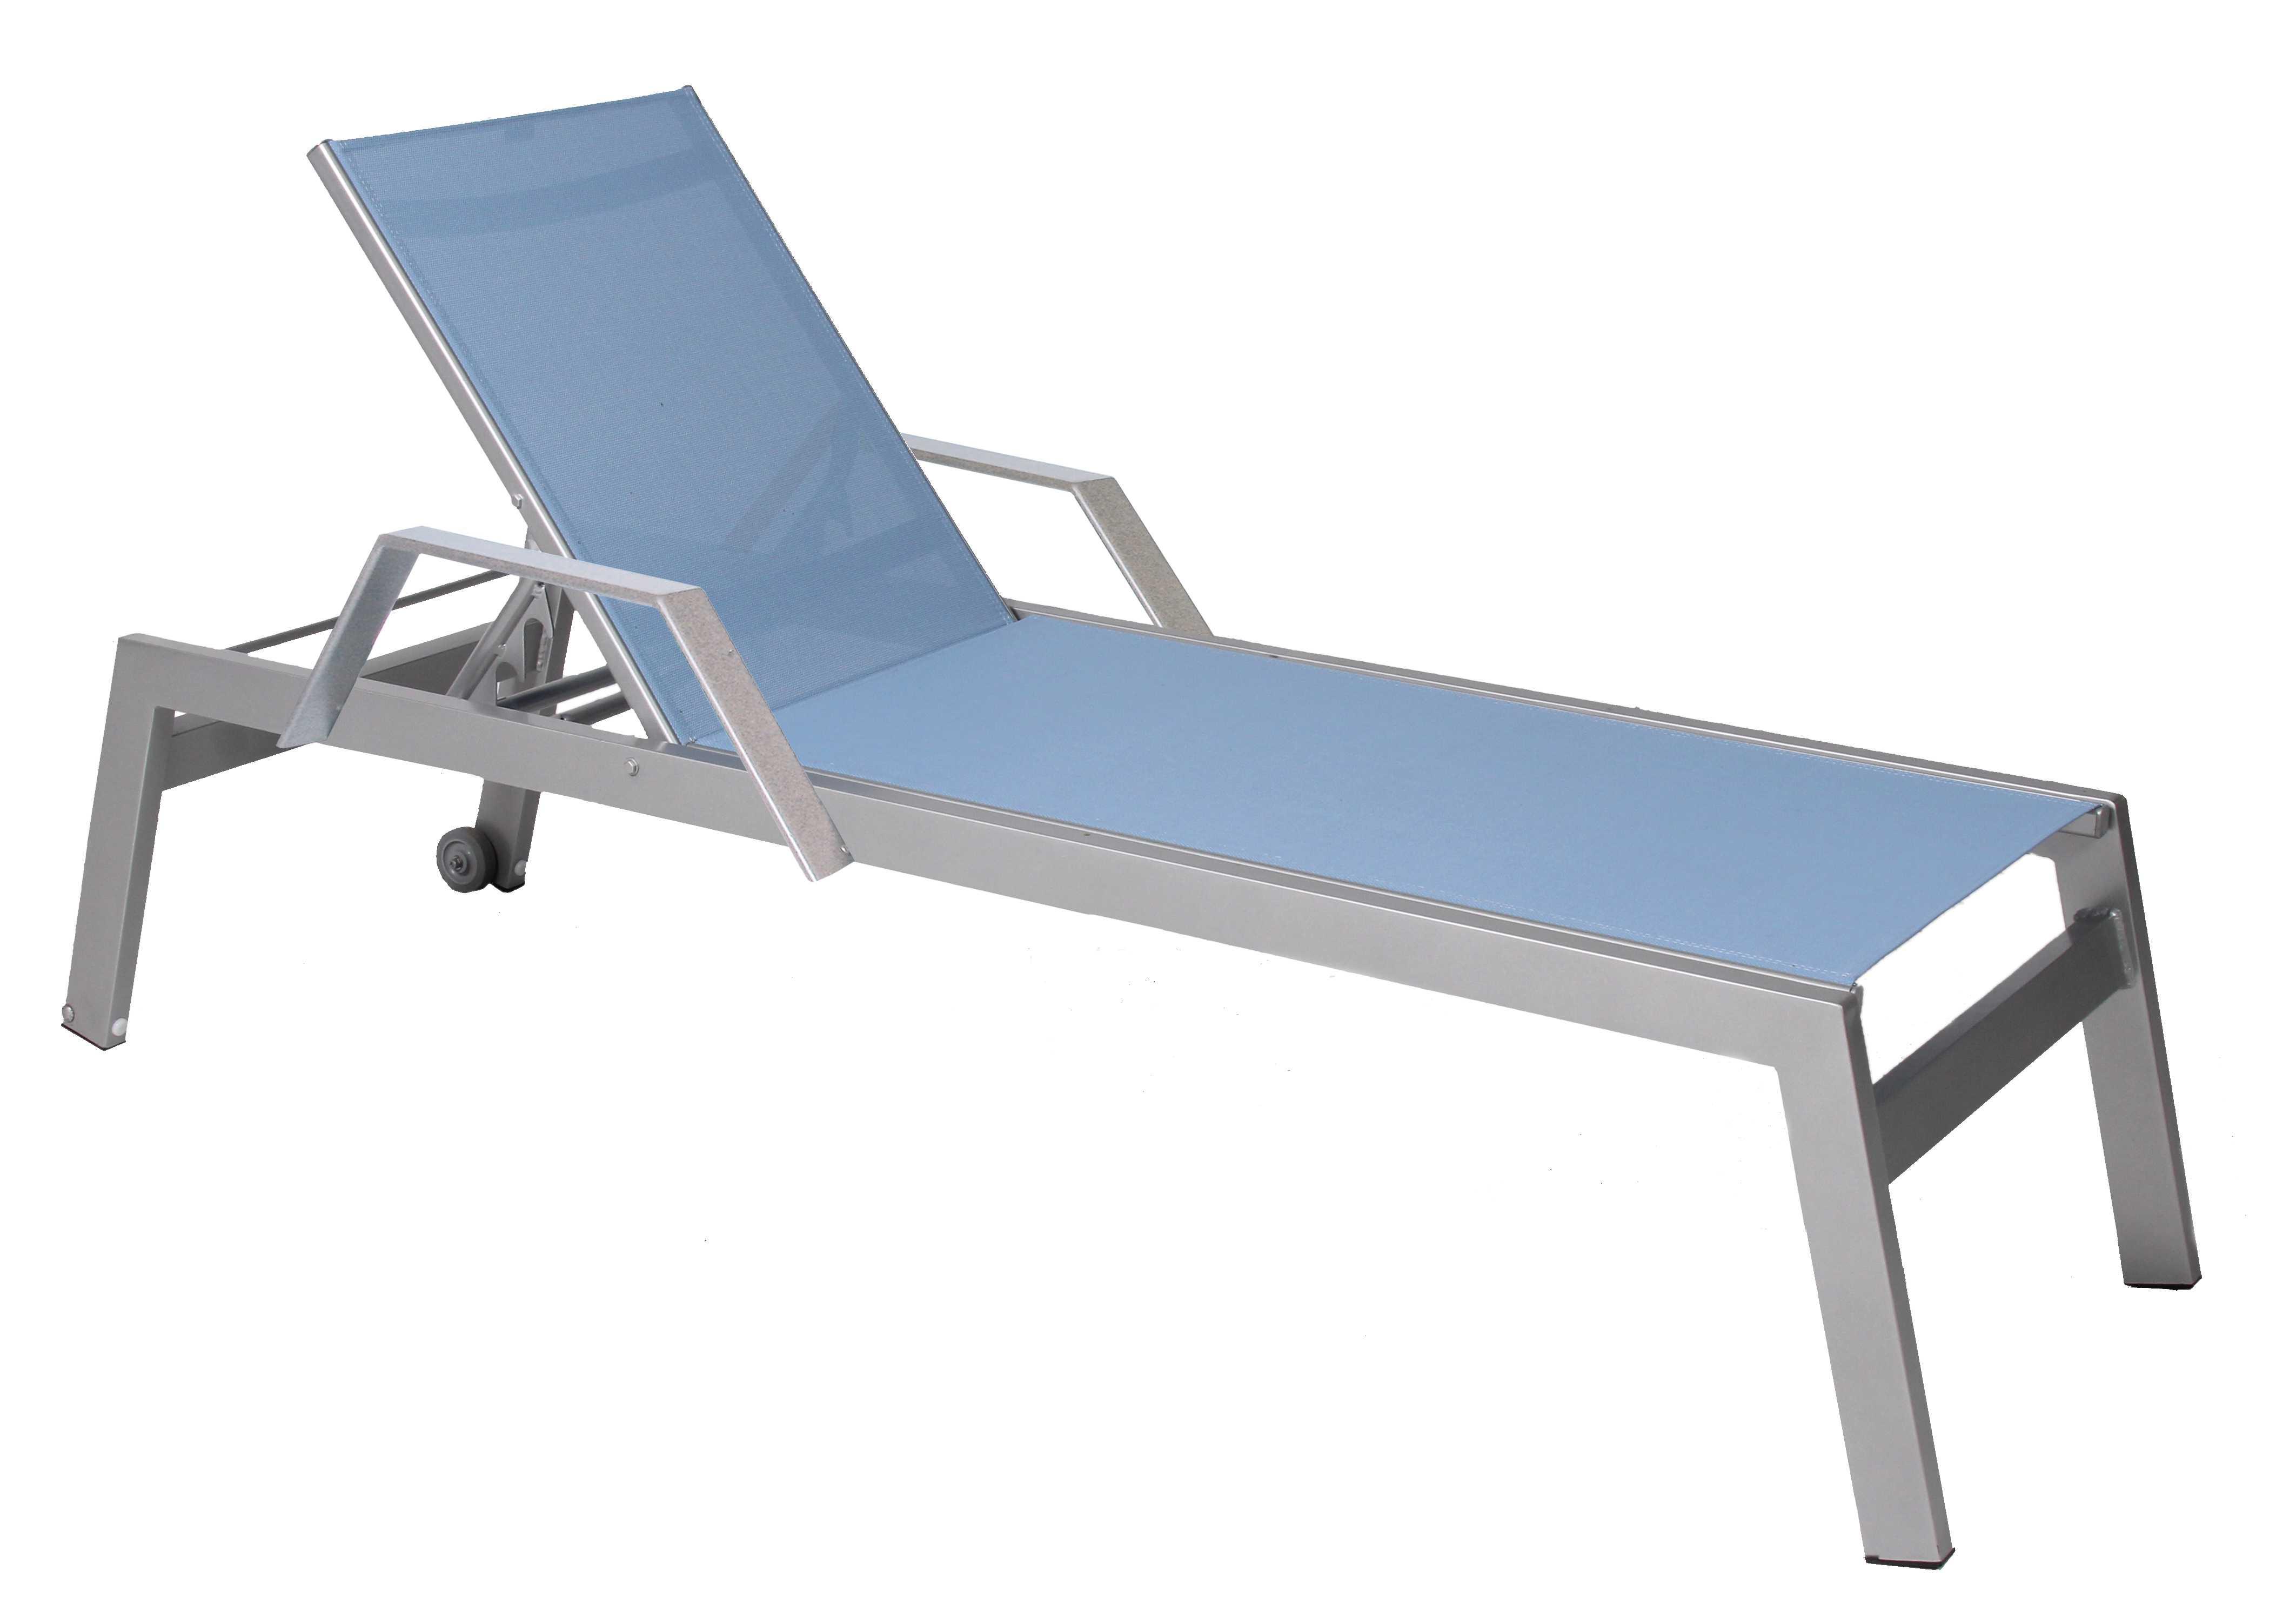 Suncoast vectra rise sling aluminum chaise lounge arms - Chaise longue aluminium ...